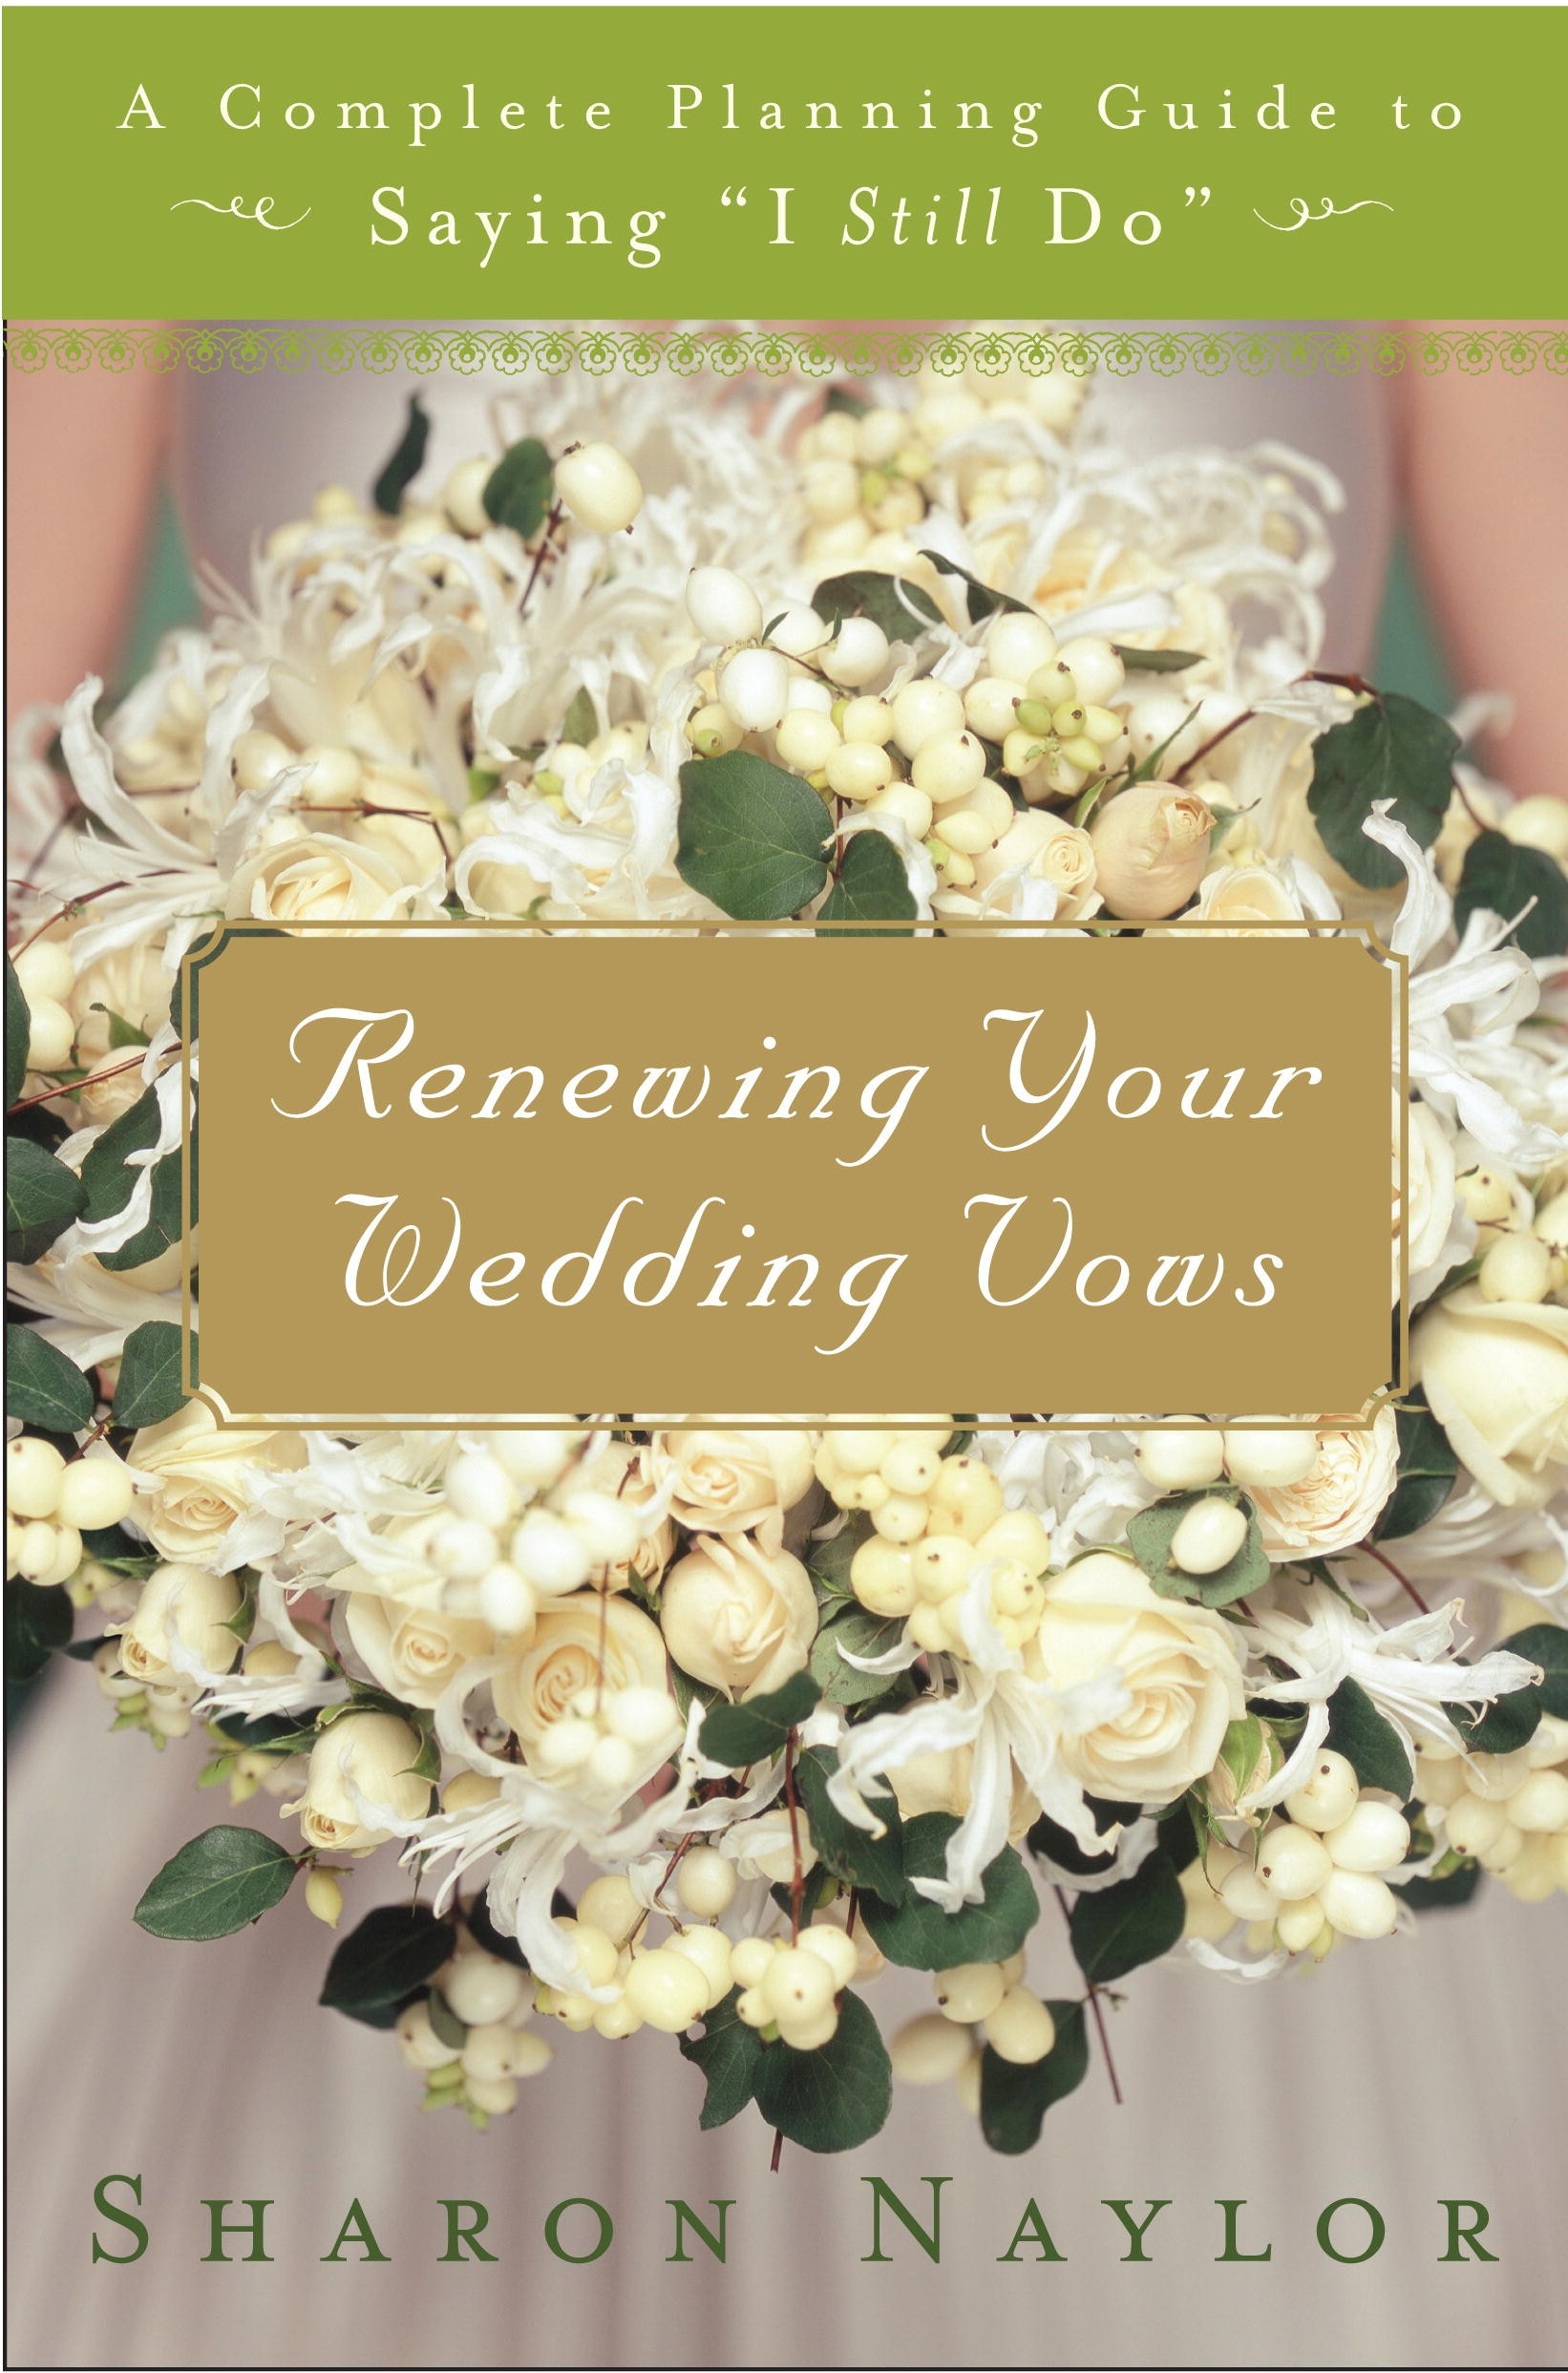 Renew Wedding Vows  renewing wedding vows